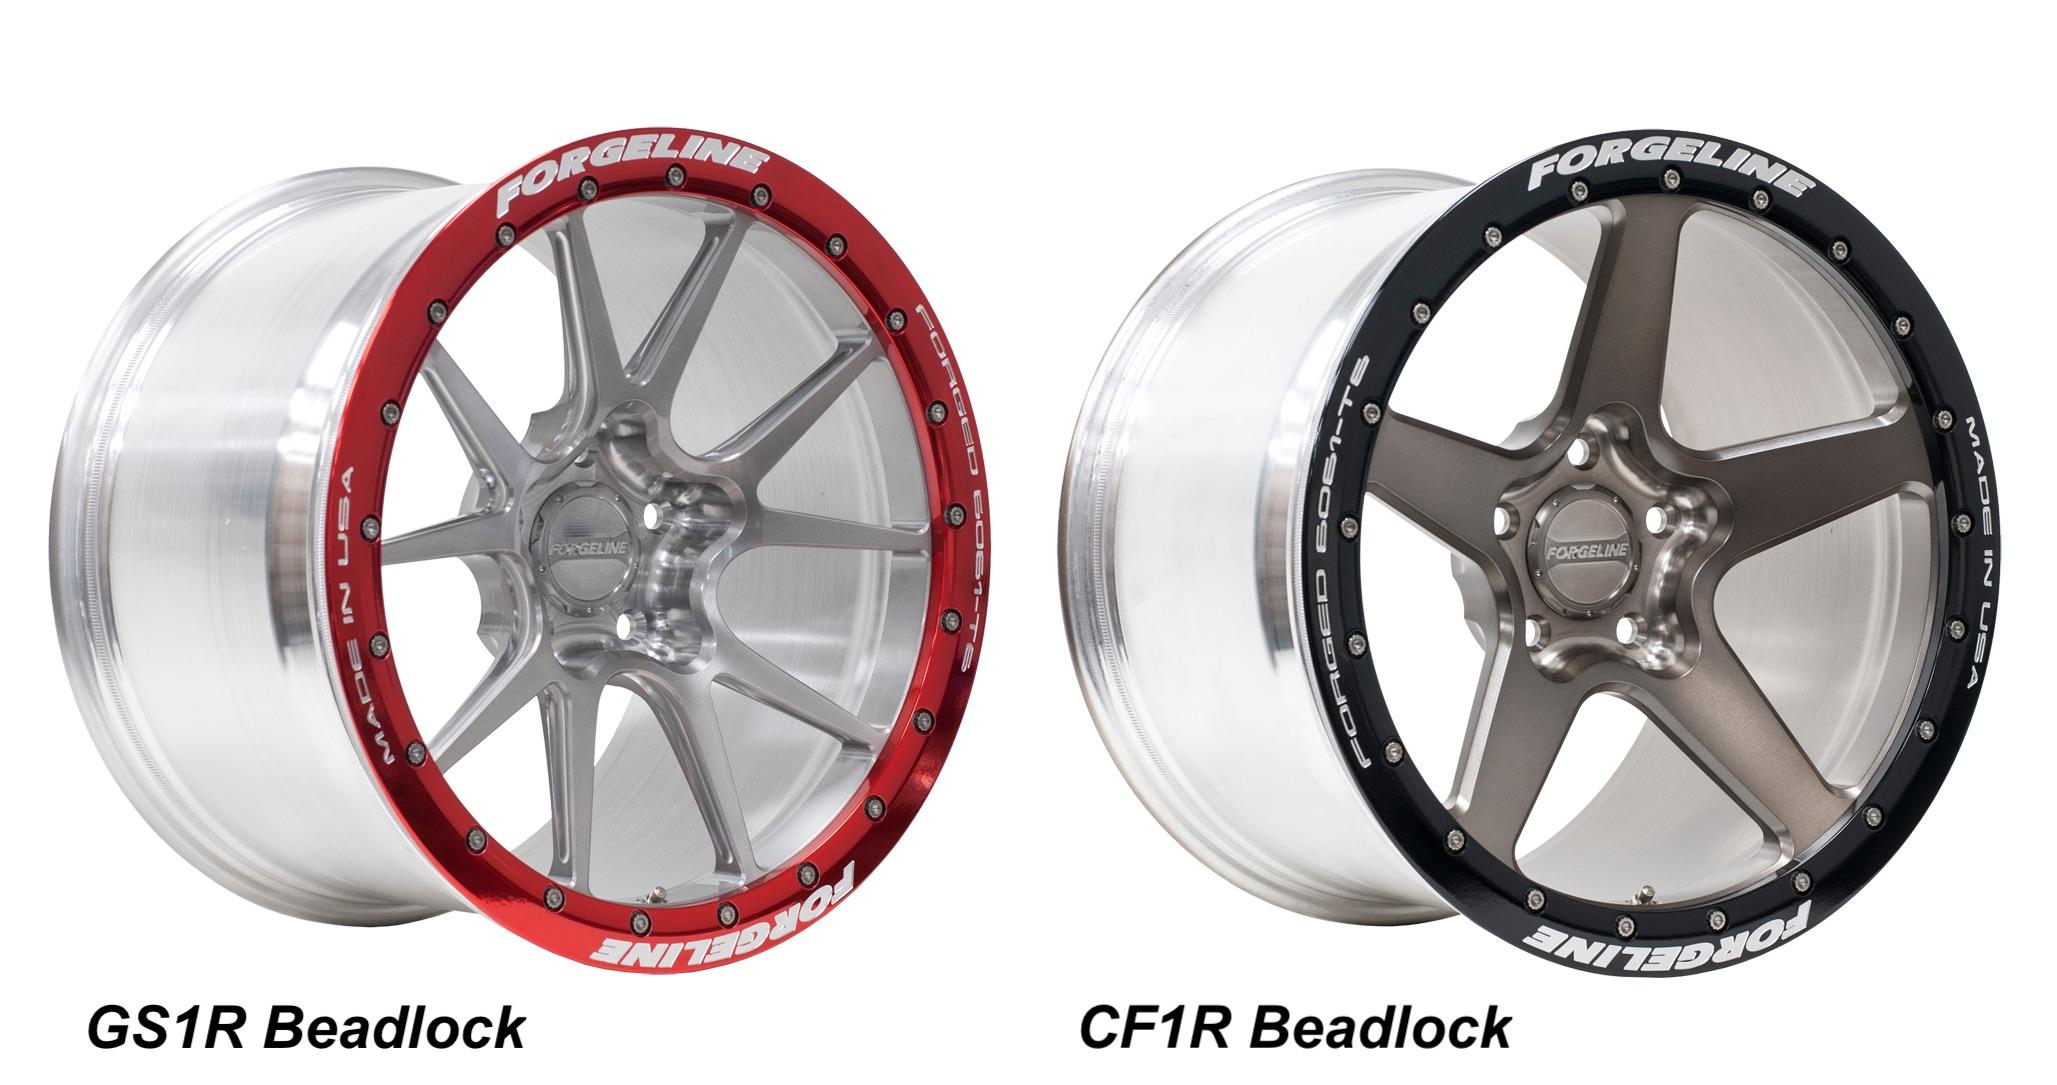 Forgeline GS1R Beadlock wheel and Forgeline CF1R Beadlock wheel